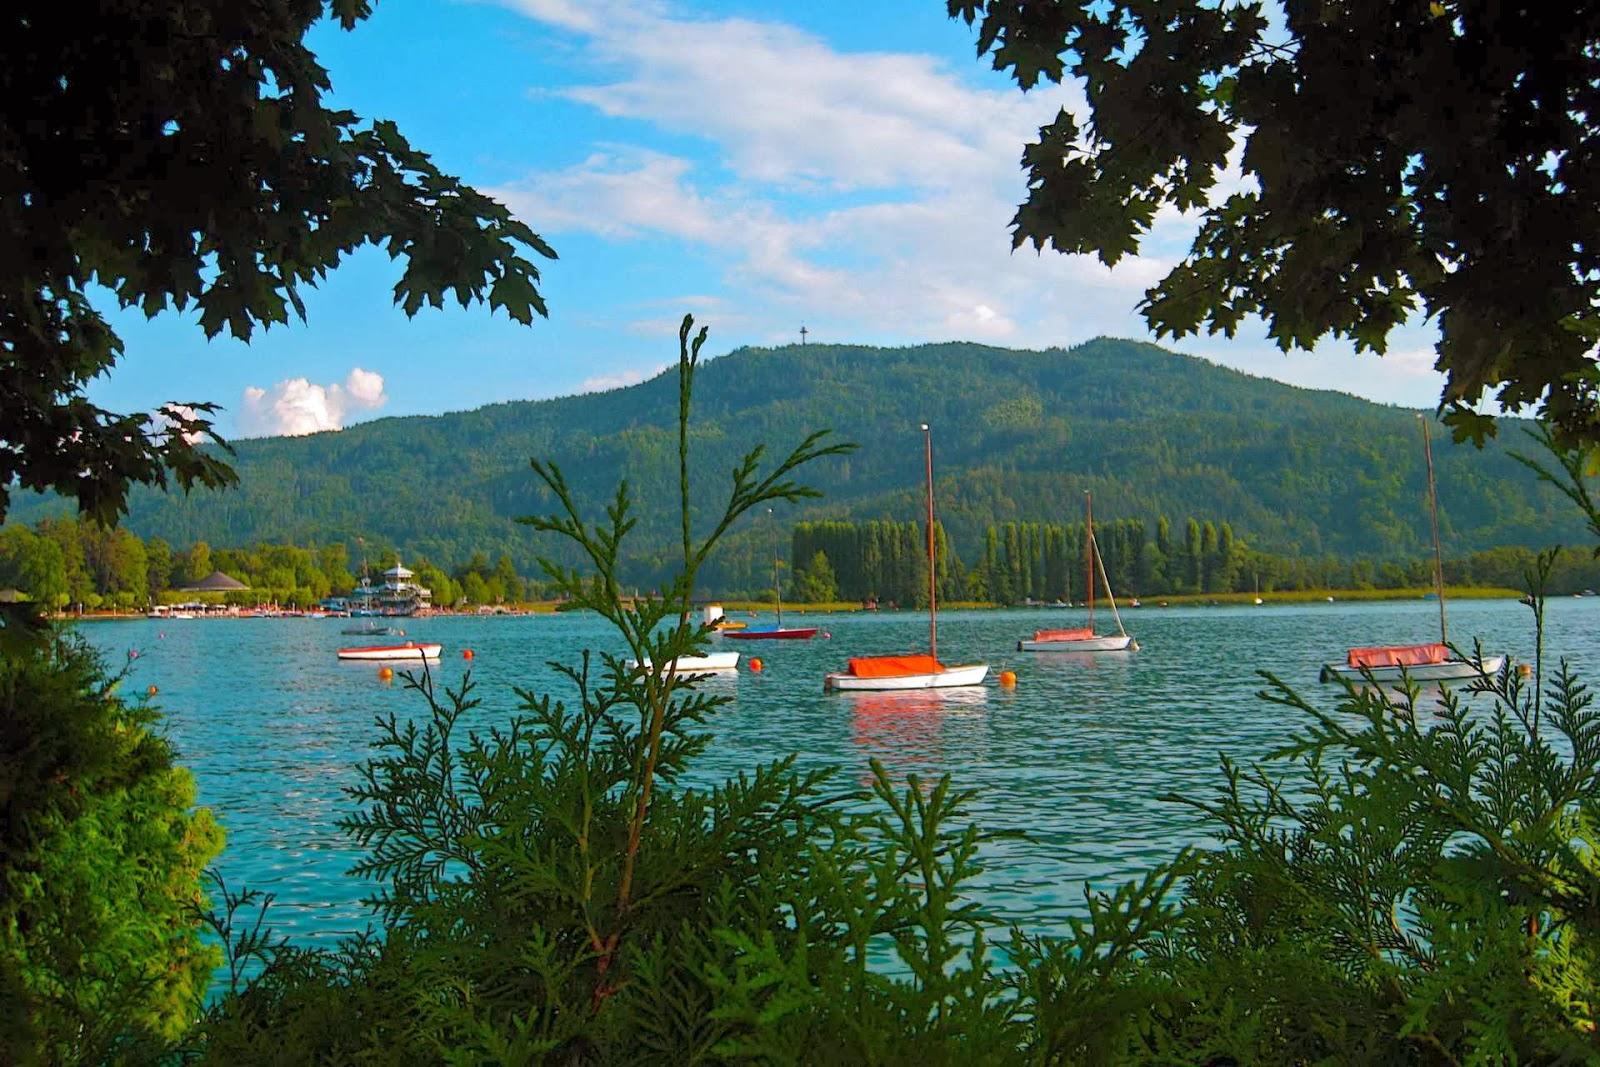 Nature wallpaper view of austria wallpaper view - Natures wallpapers for desktop ...